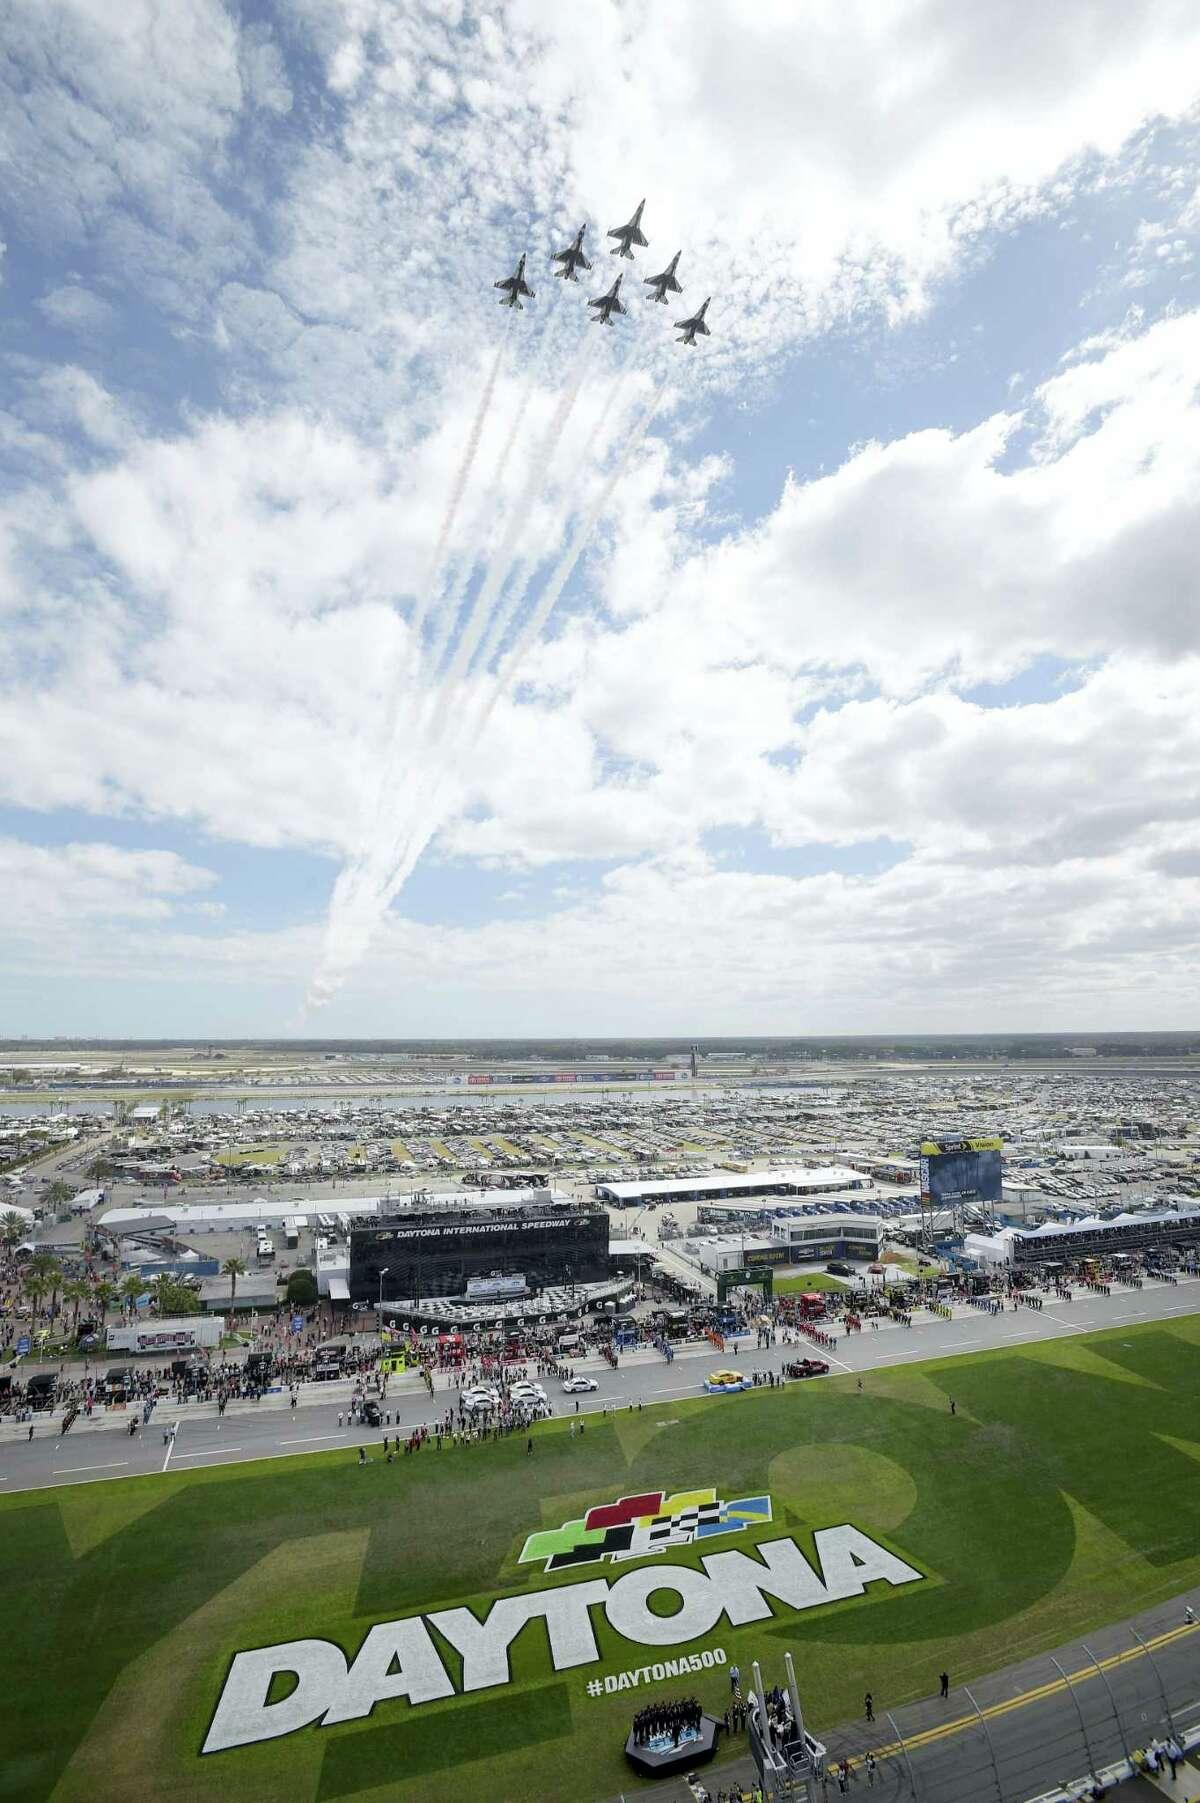 The U.S. Air Force Thunderbirds perform a flyover before the NASCAR Daytona 500 Sprint Cup series auto race at Daytona International Speedway on Feb. 21, 2016, in Daytona Beach, Fla.